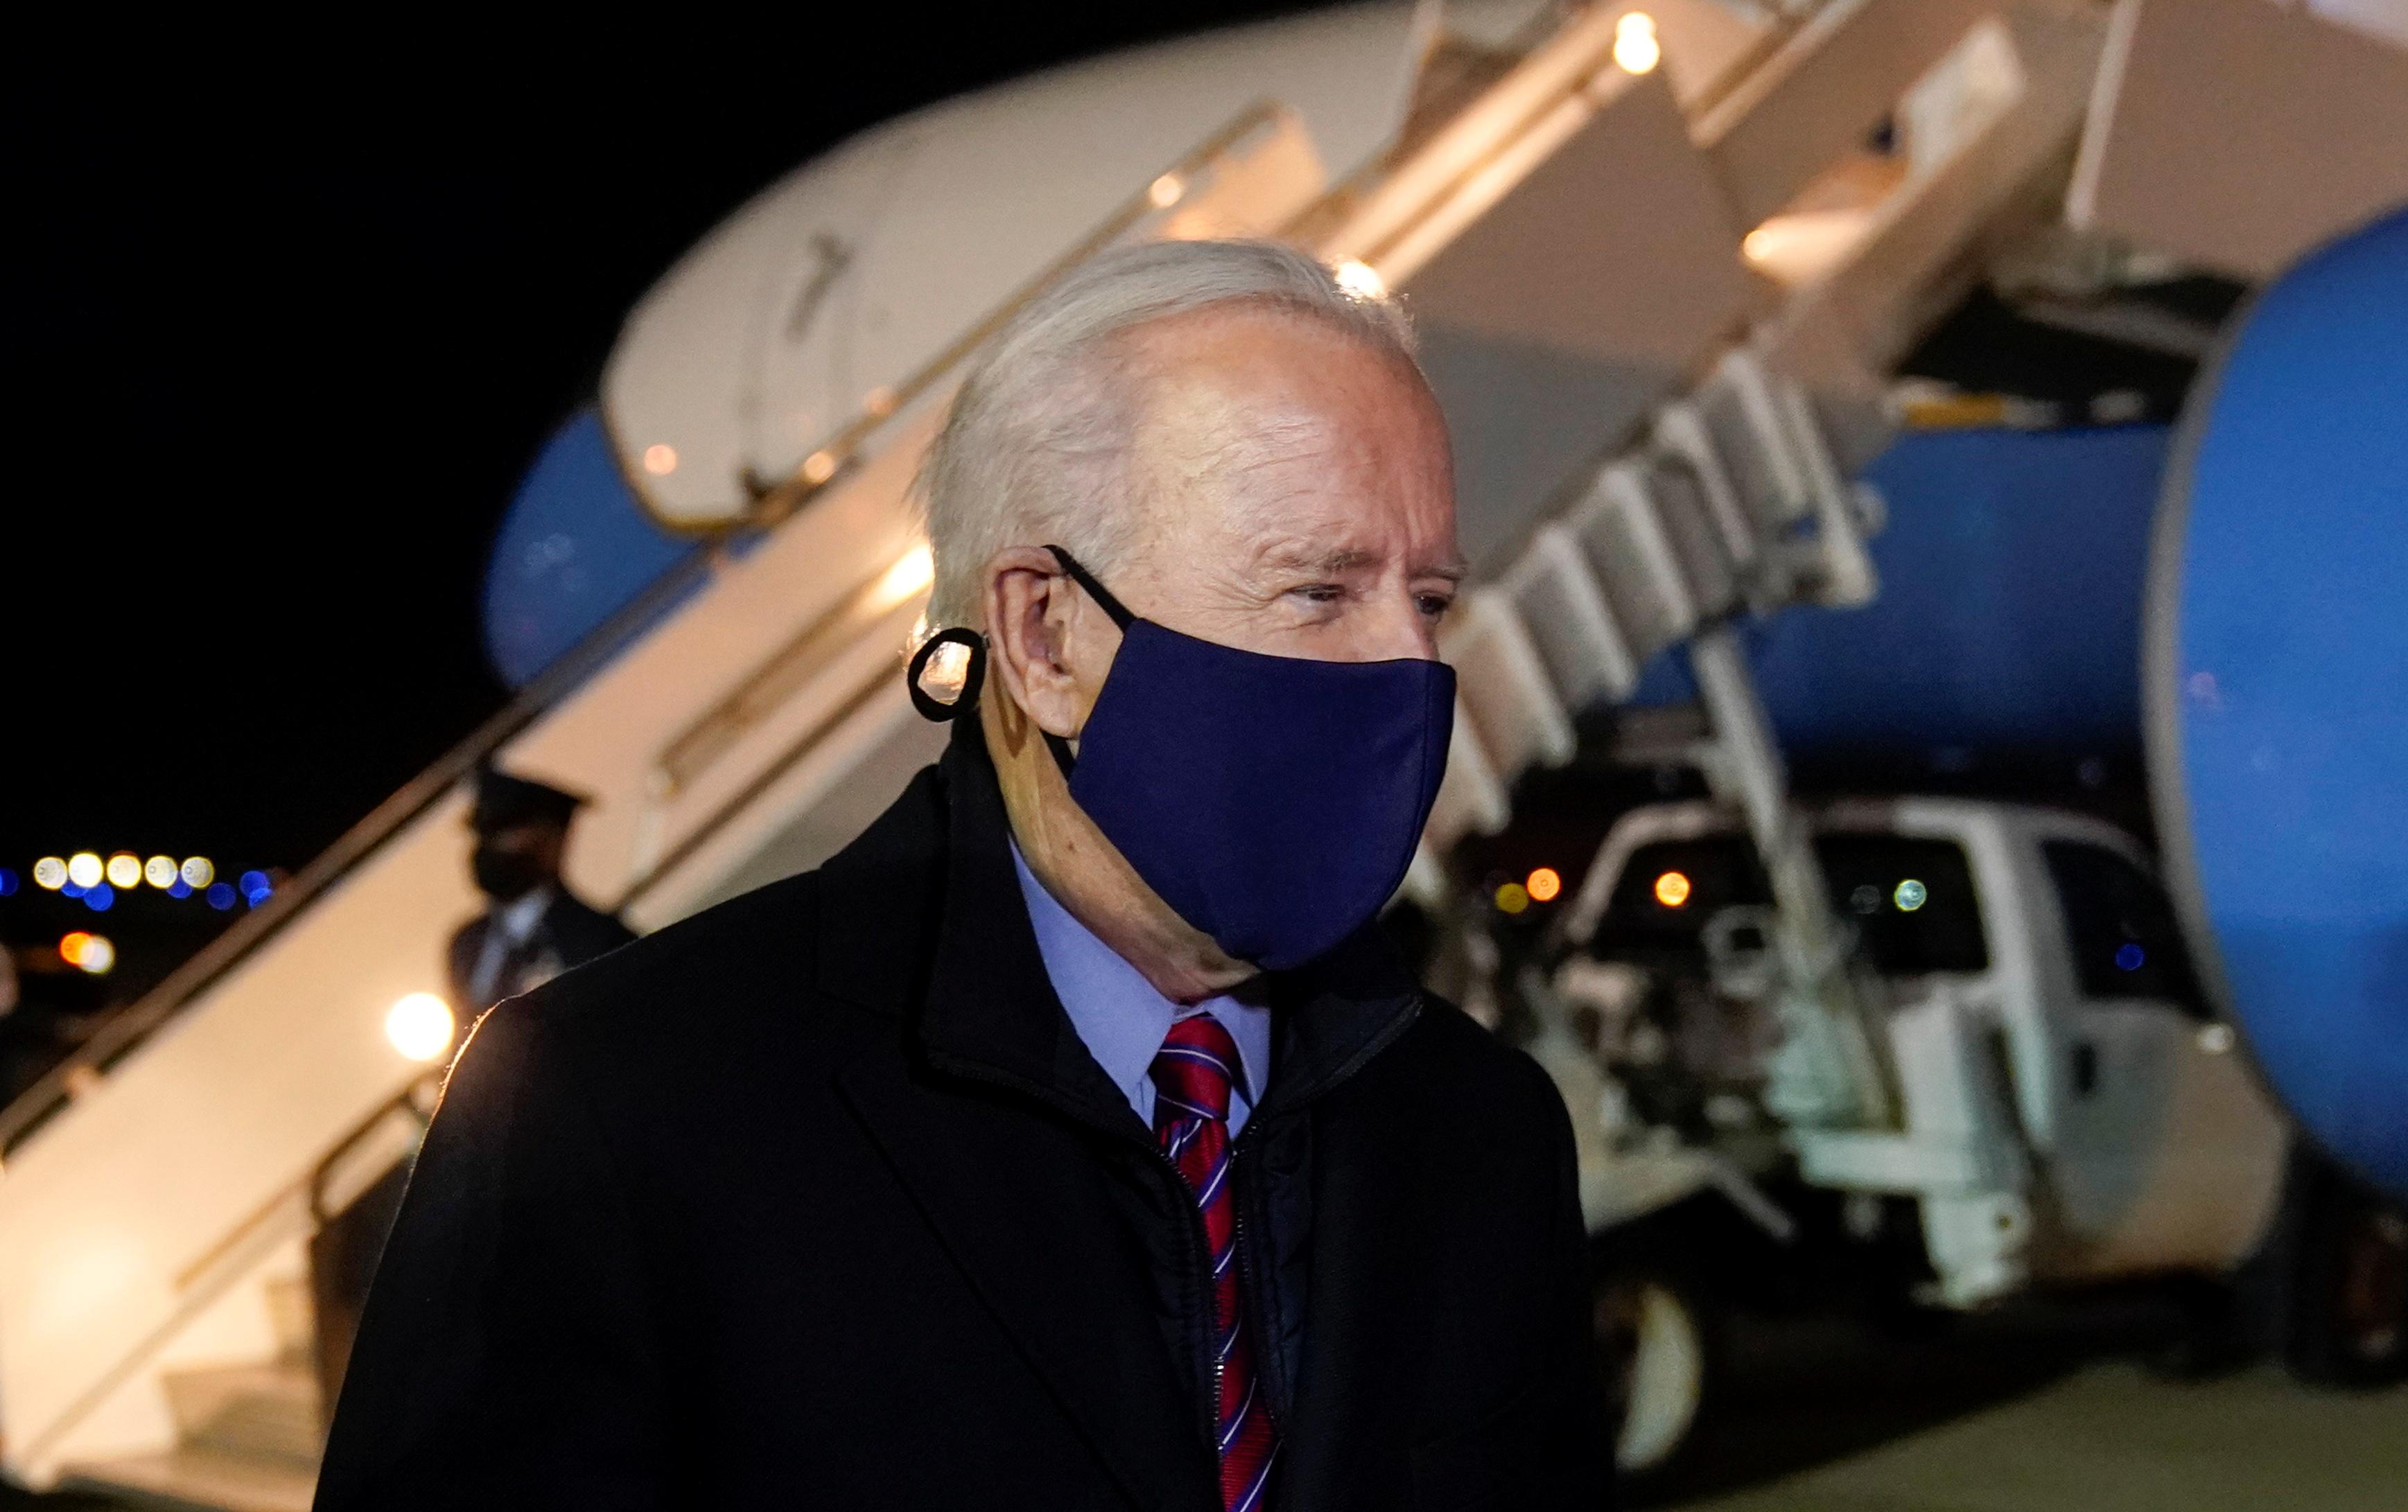 U.S. President Joe Bidenwears a face mask as he arrives at Newcastle, Delaware U.S., February 5, 2021. REUTERS/Joshua Roberts